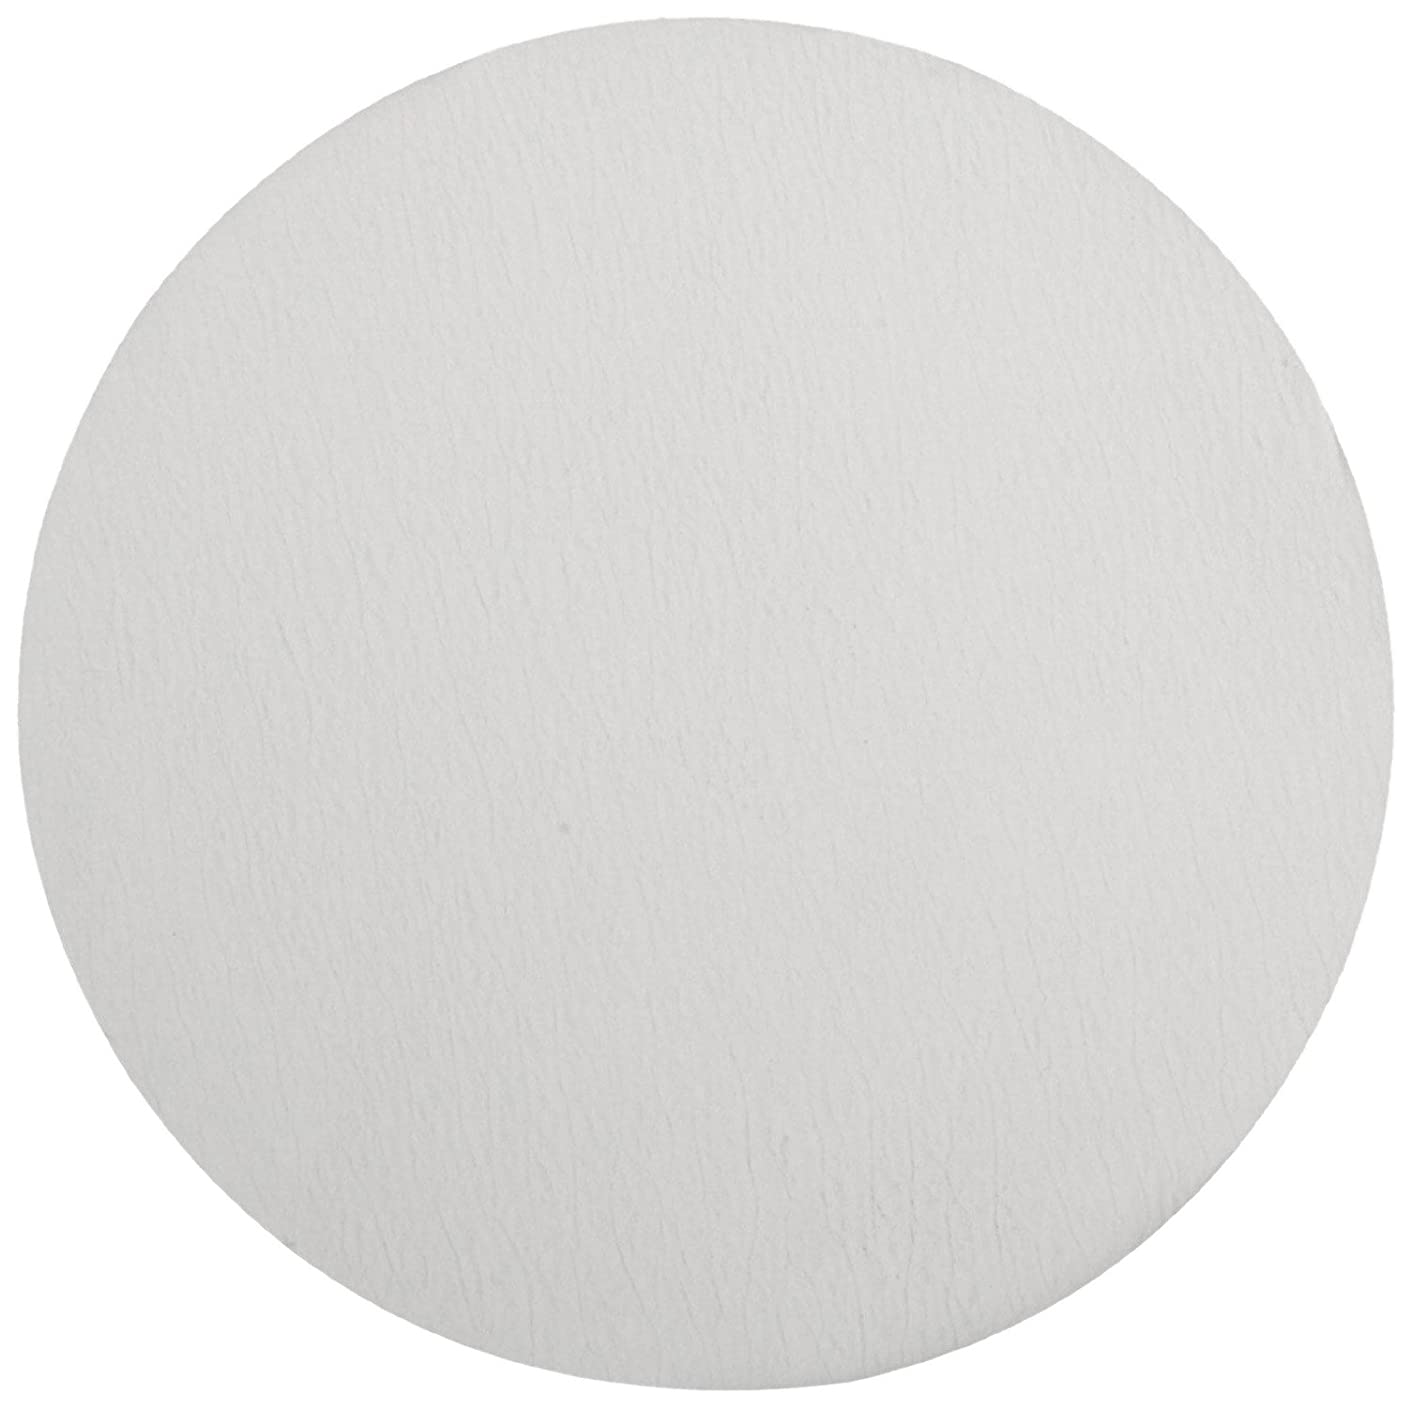 Ahlstrom 2370-1250 Qualitative Filter Paper Circle, 3 Micron, Grade 237, 12.5cm Diameter (Pack of 50)